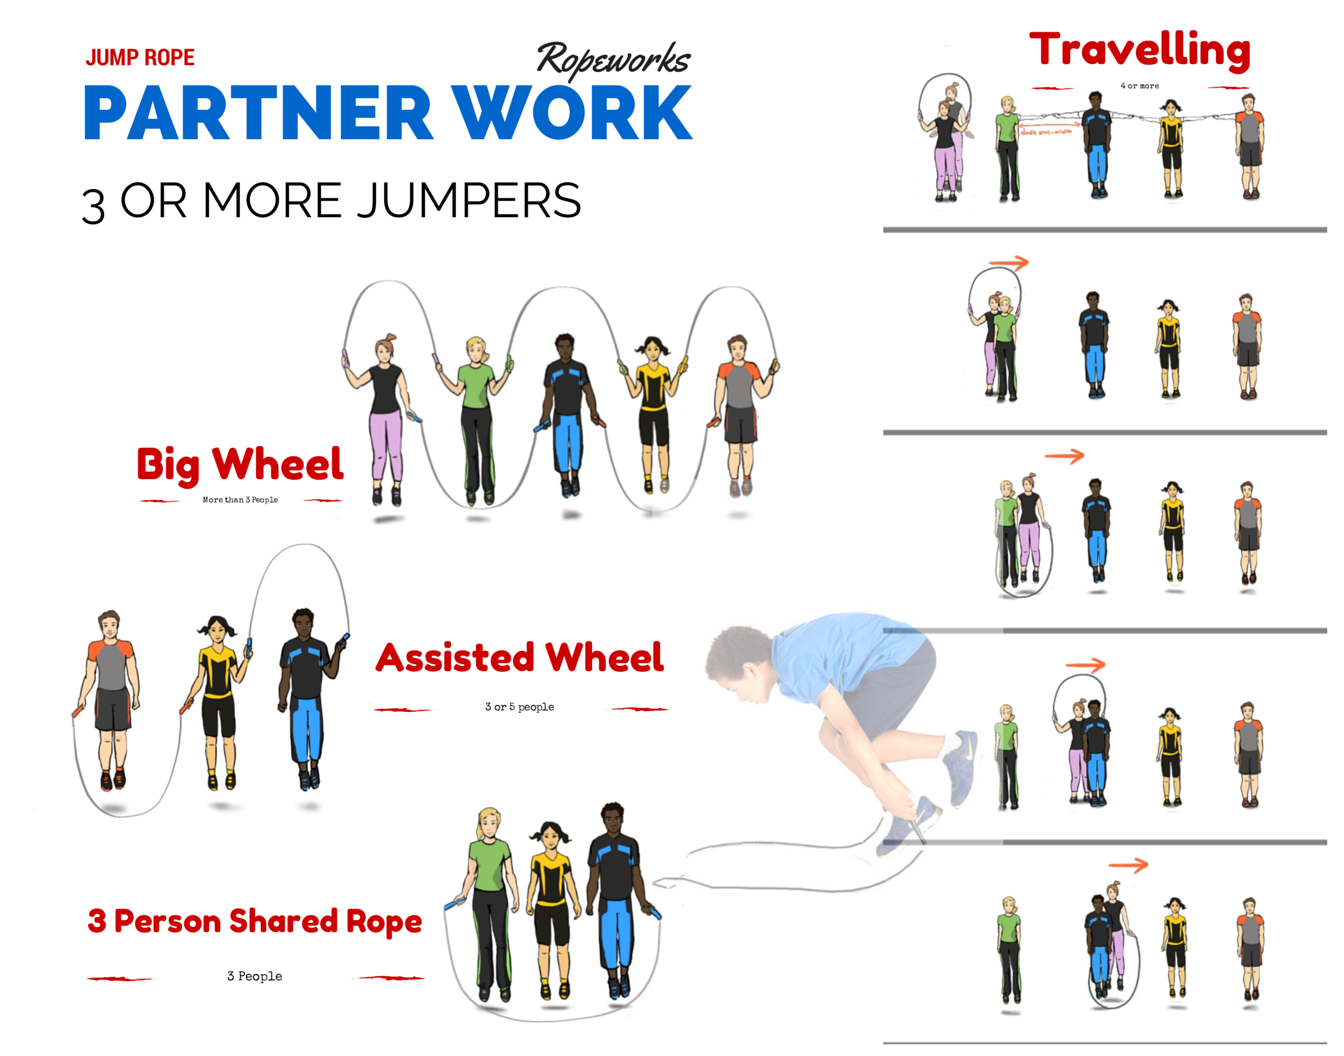 Partner Work Jump Rope Skills, Instruction and